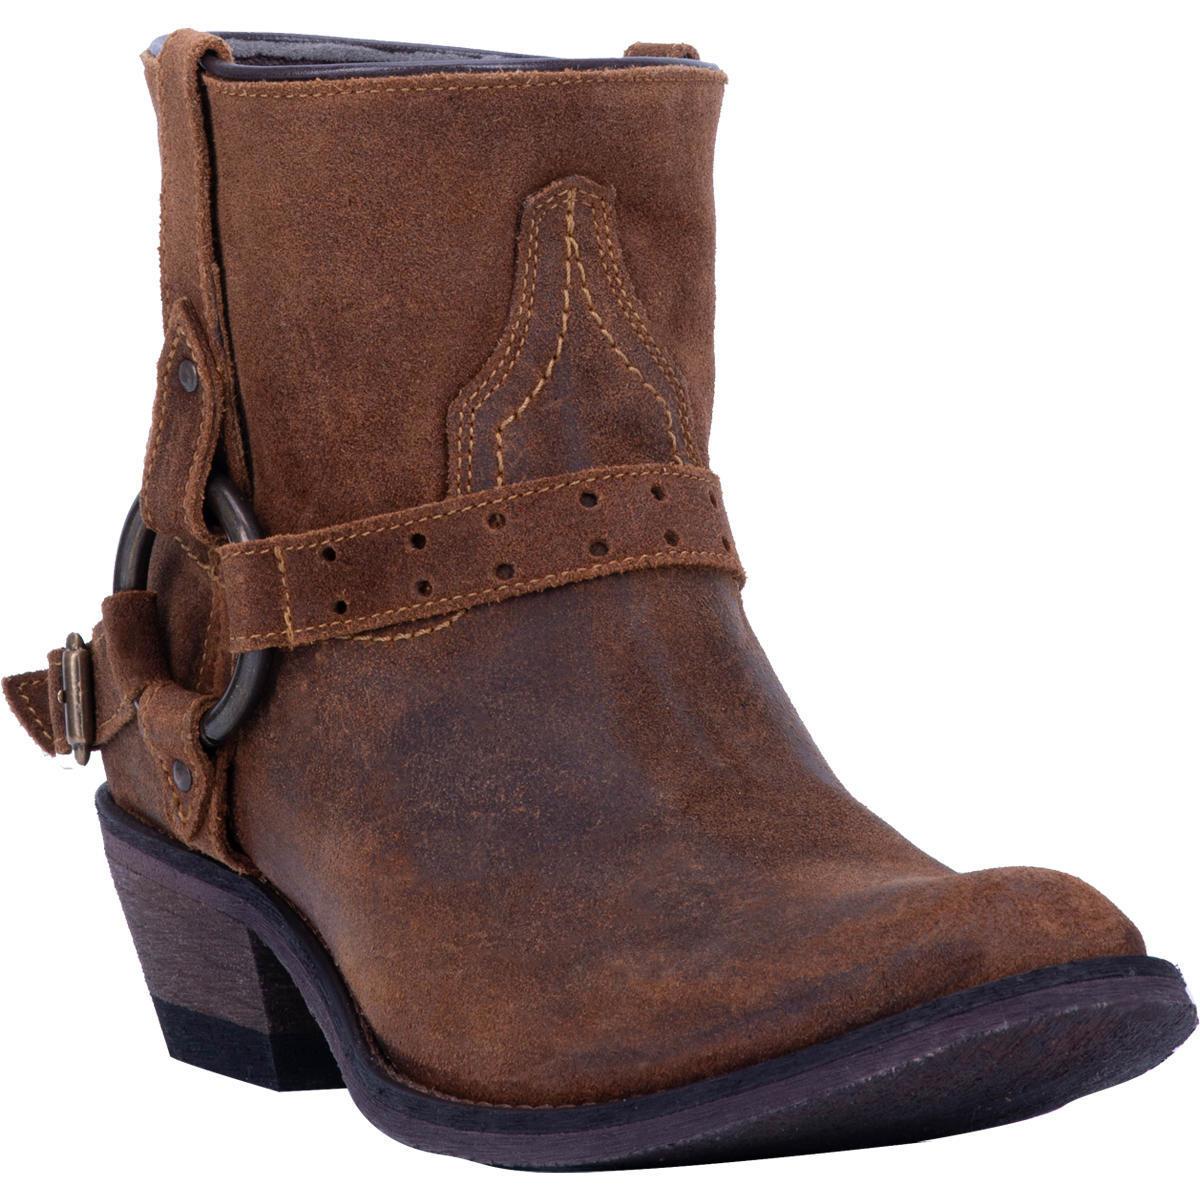 Laredo Women's Laredo Emersyn Boot (REG $119.95 NOW $20 OFF!)